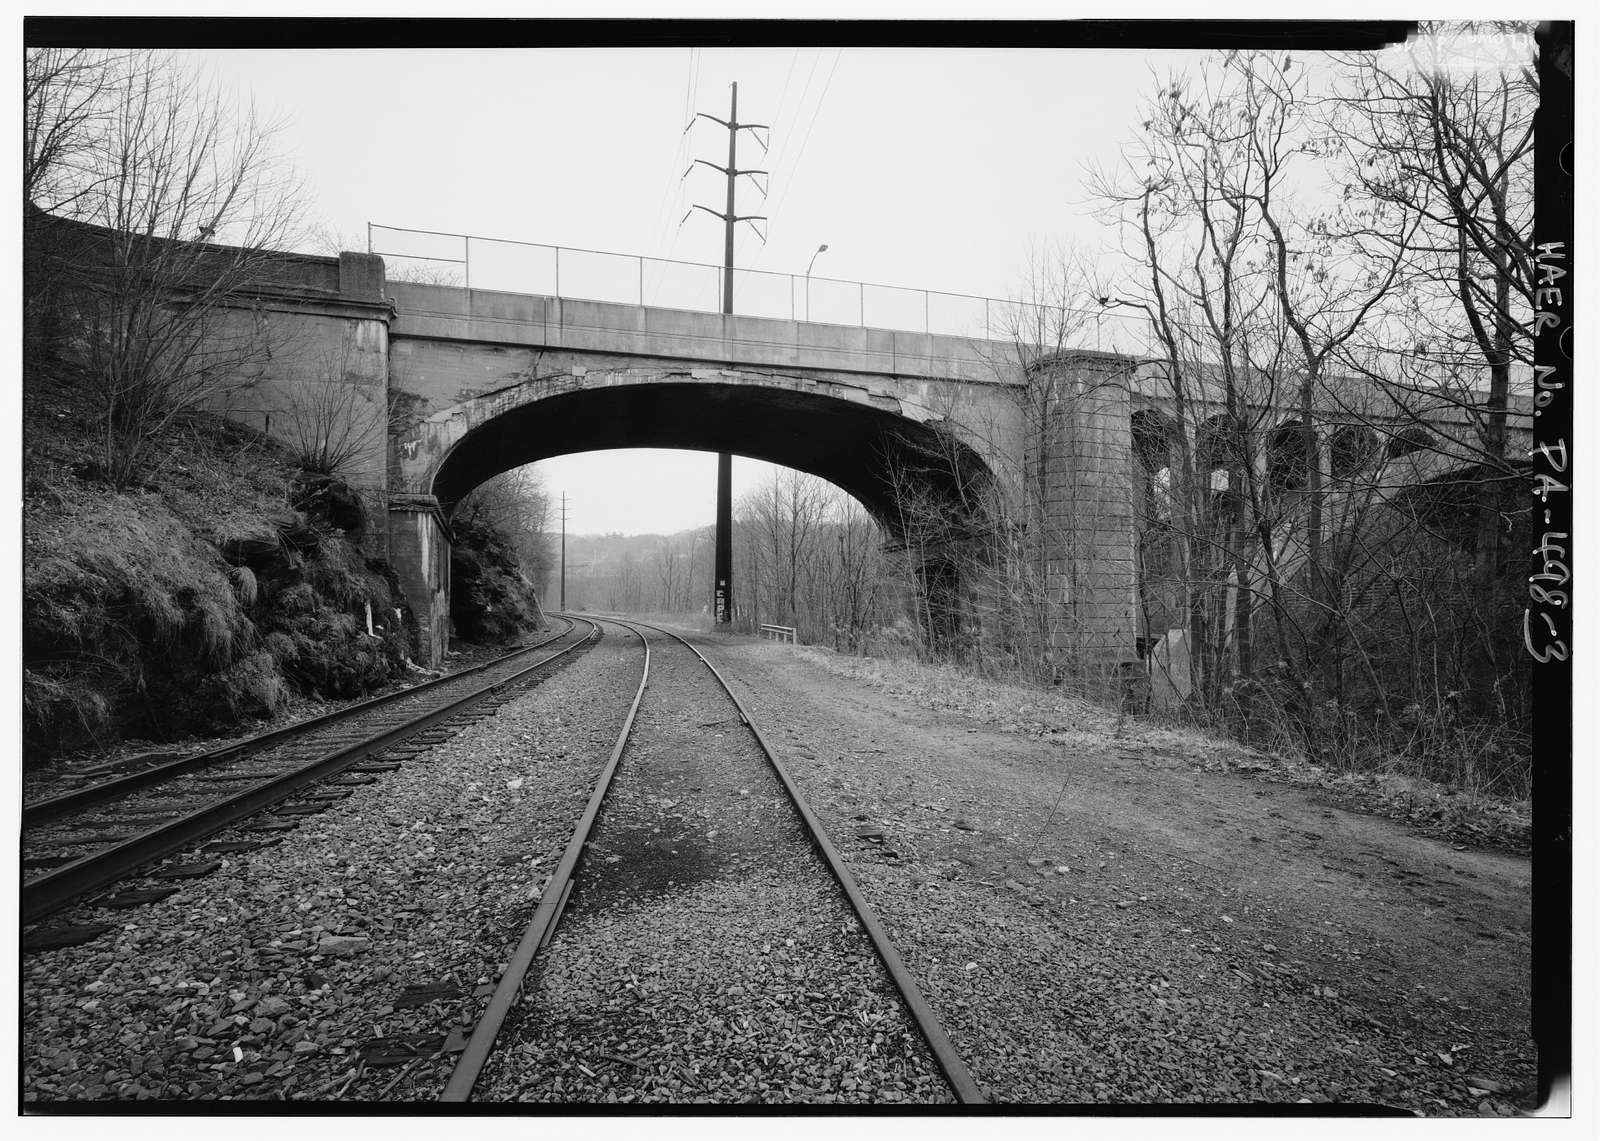 Harrison Avenue Bridge, Spanning Roaring Brook & Central Scranton Expressway (State Route 3022) at Harrison Avenue (State Route 6011), Scranton, Lackawanna County, PA